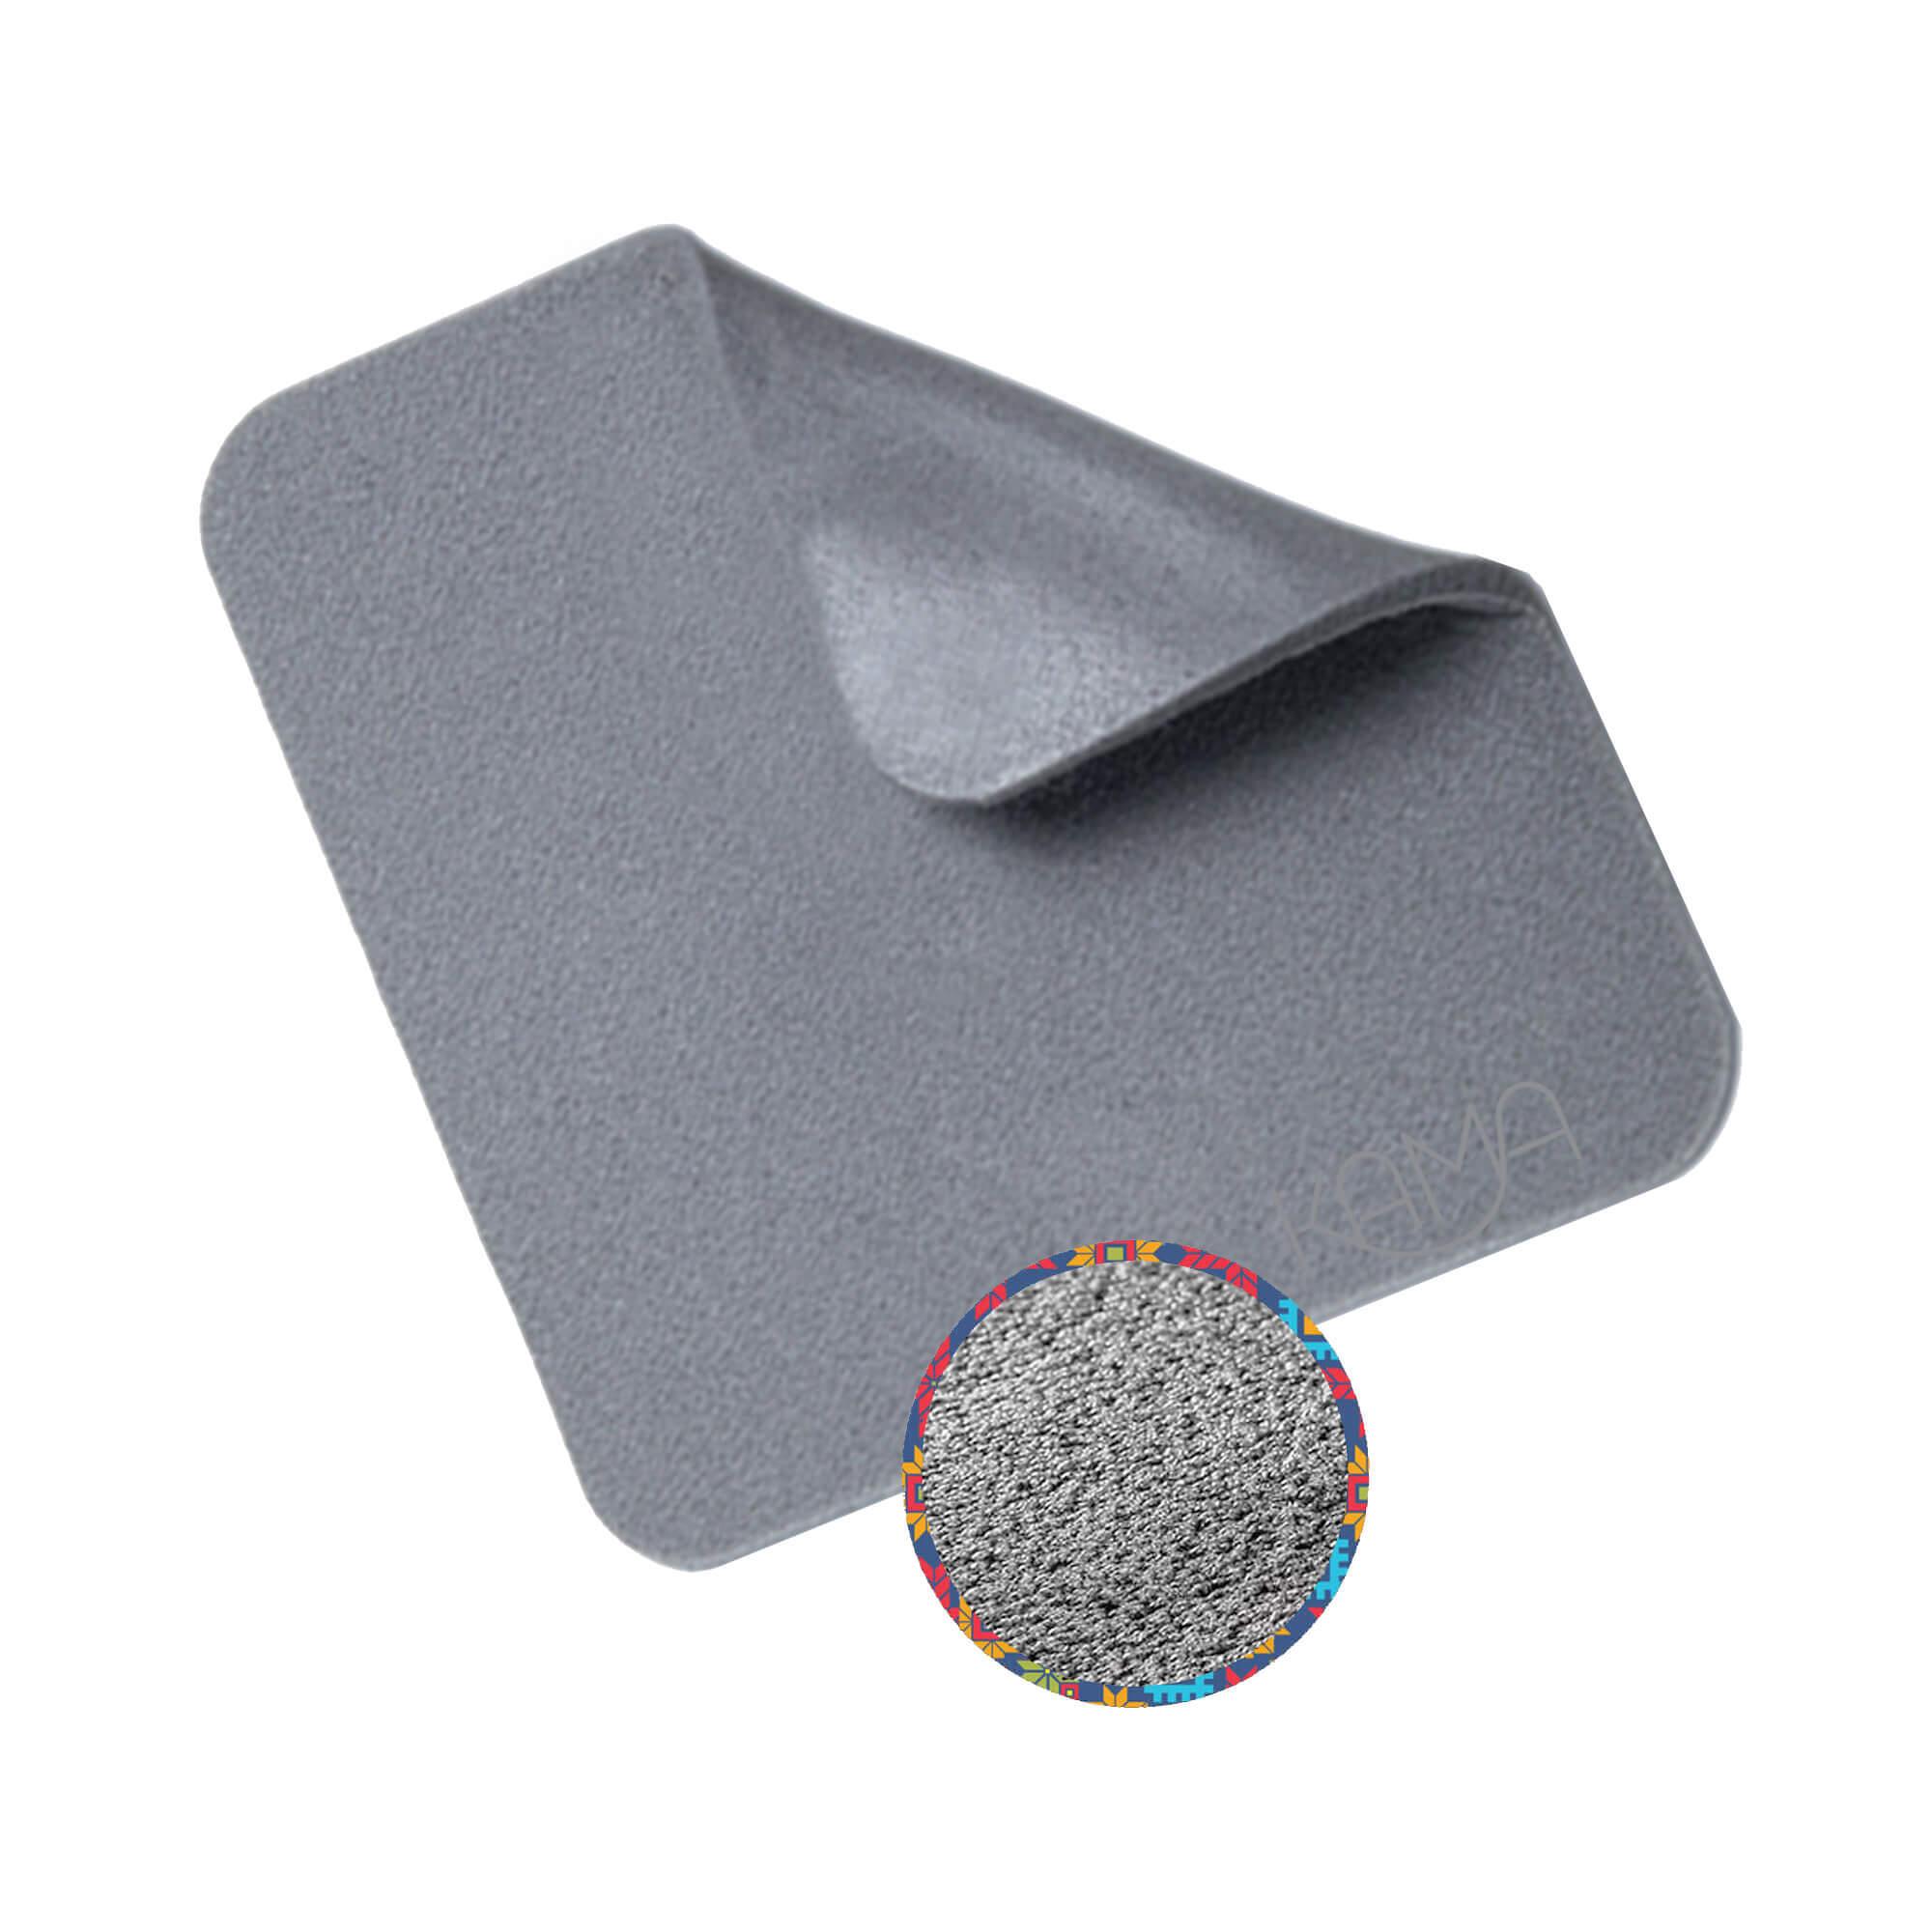 Повязка Мепилекс с серебром 10х10 см